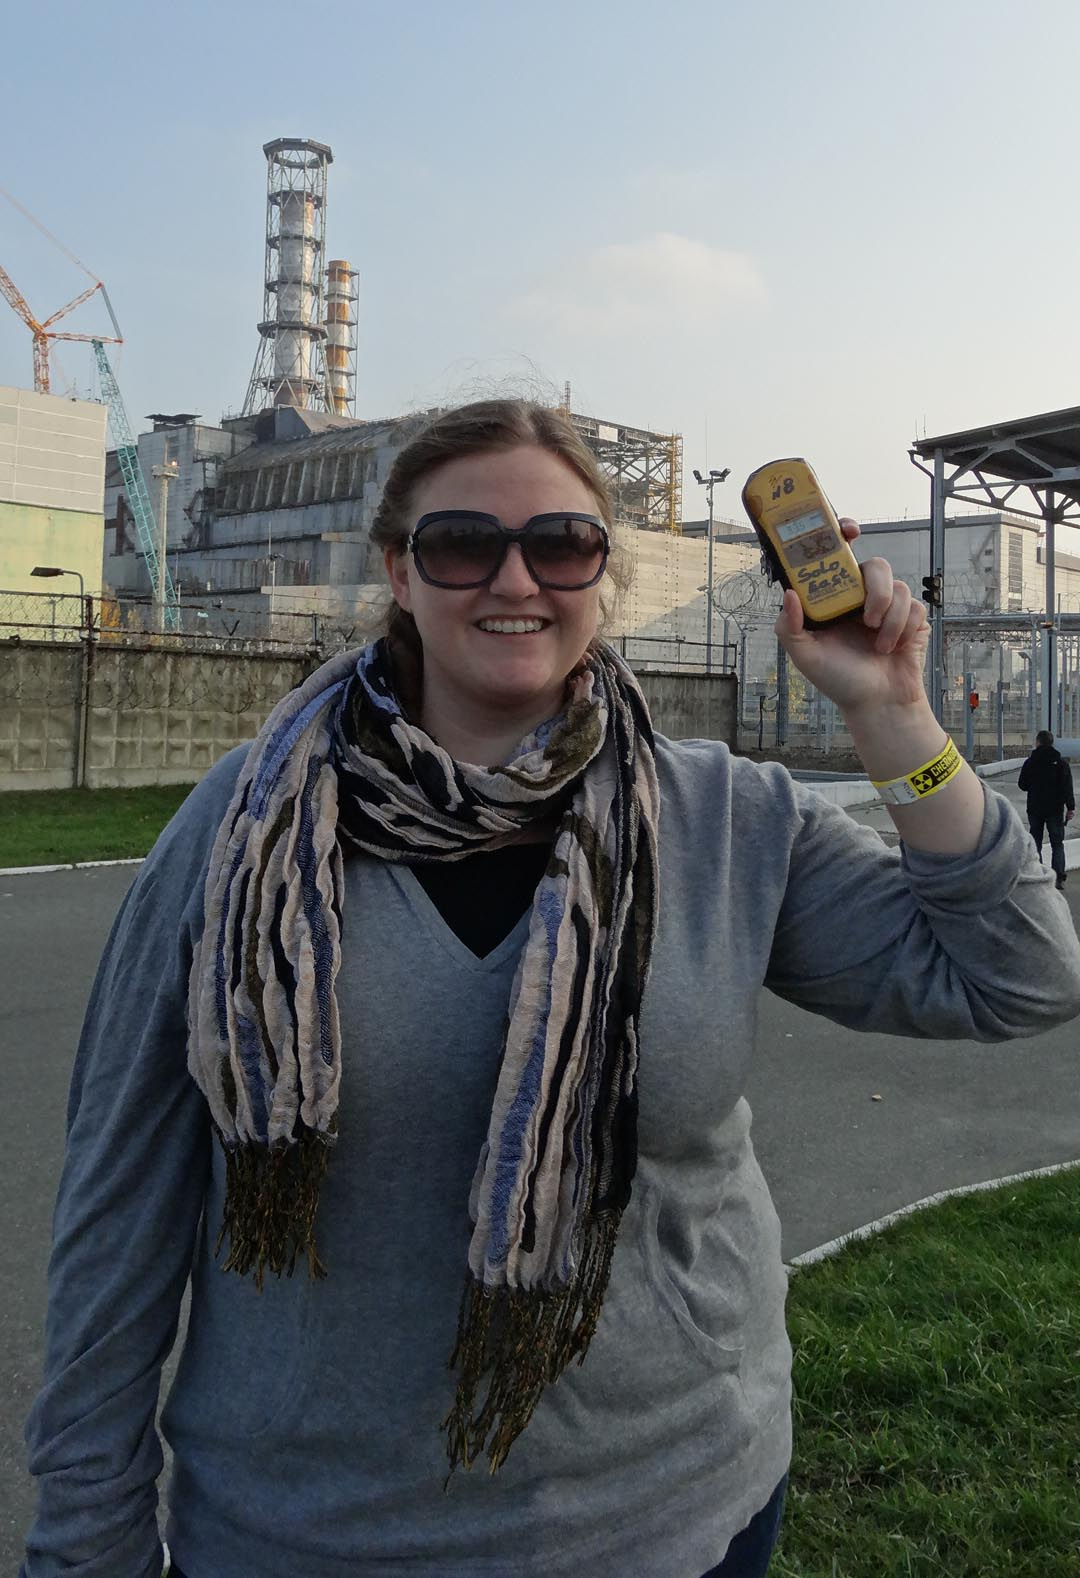 Solo Travel in Chernobyl